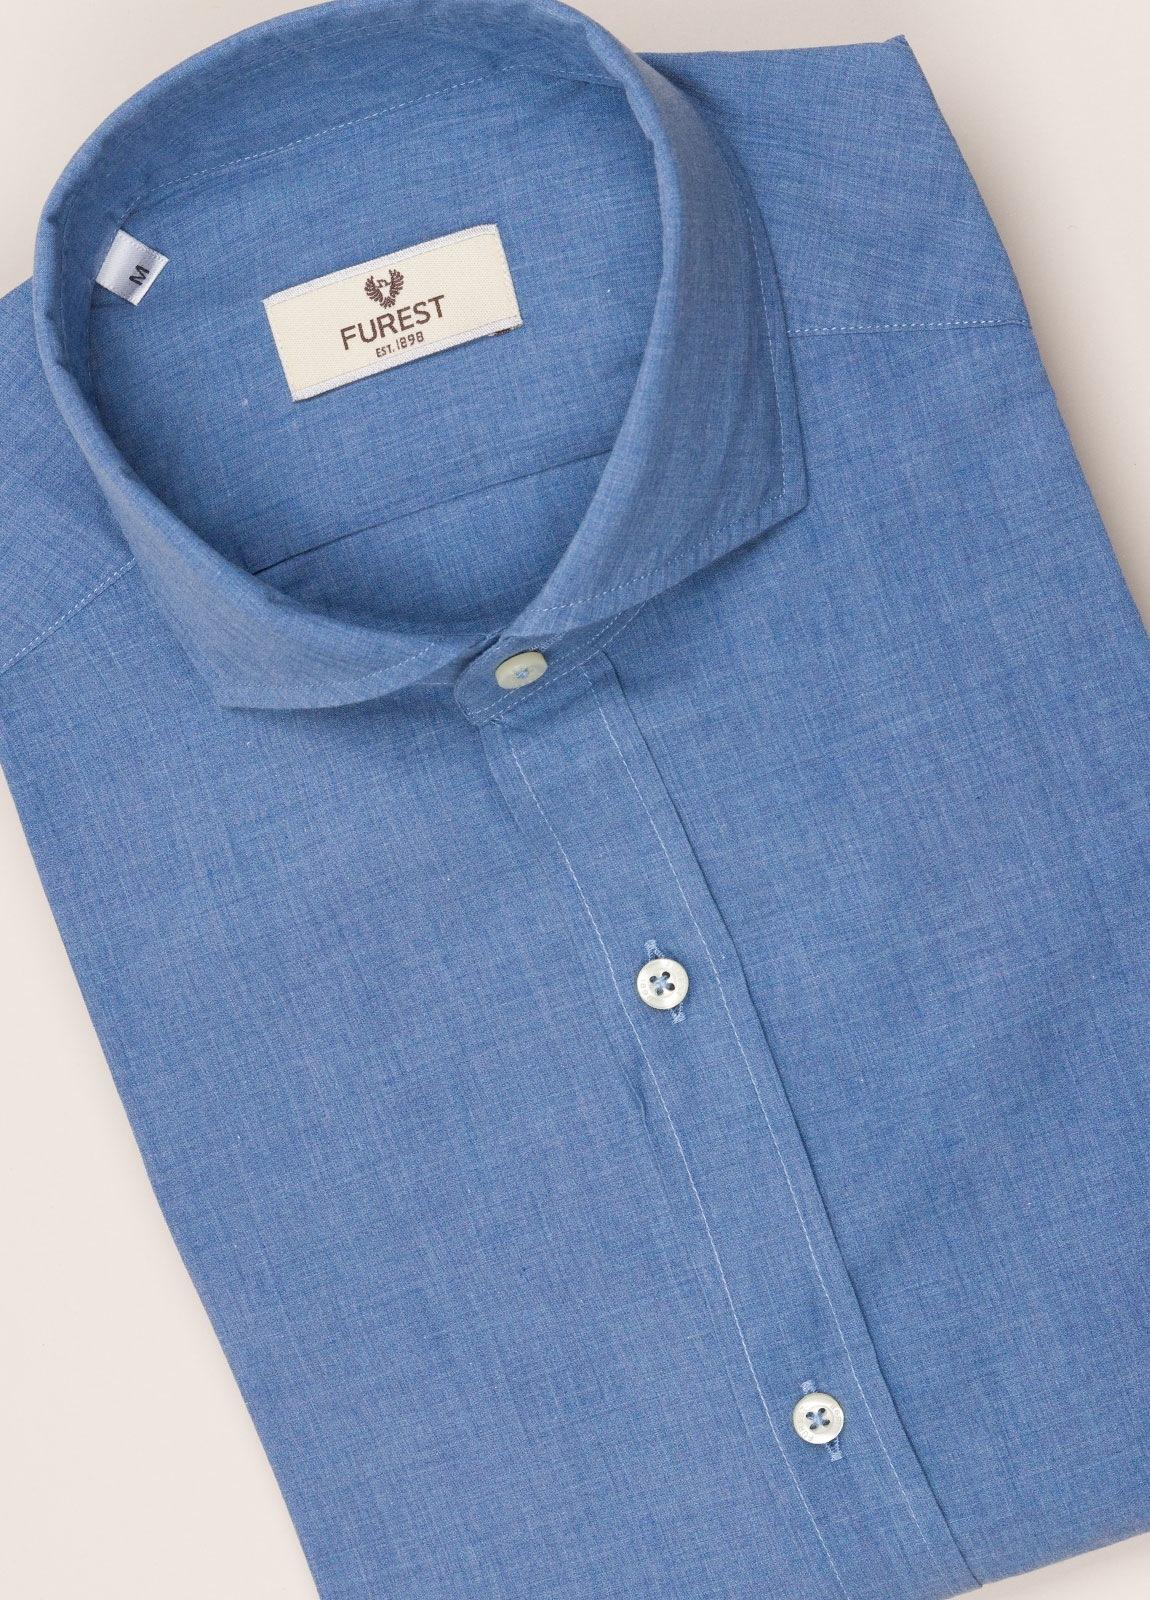 Camisa sport FUREST COLECCIÓN SLIM FIT azul denim - Ítem1